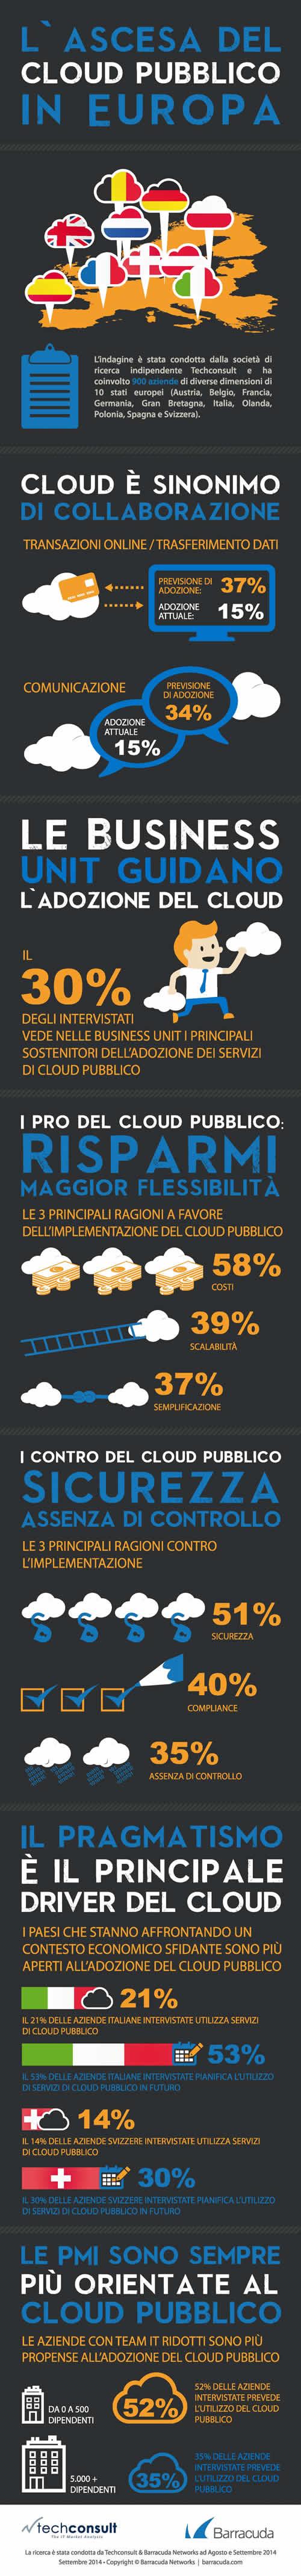 INFOGRAFICA_cloud pubblico